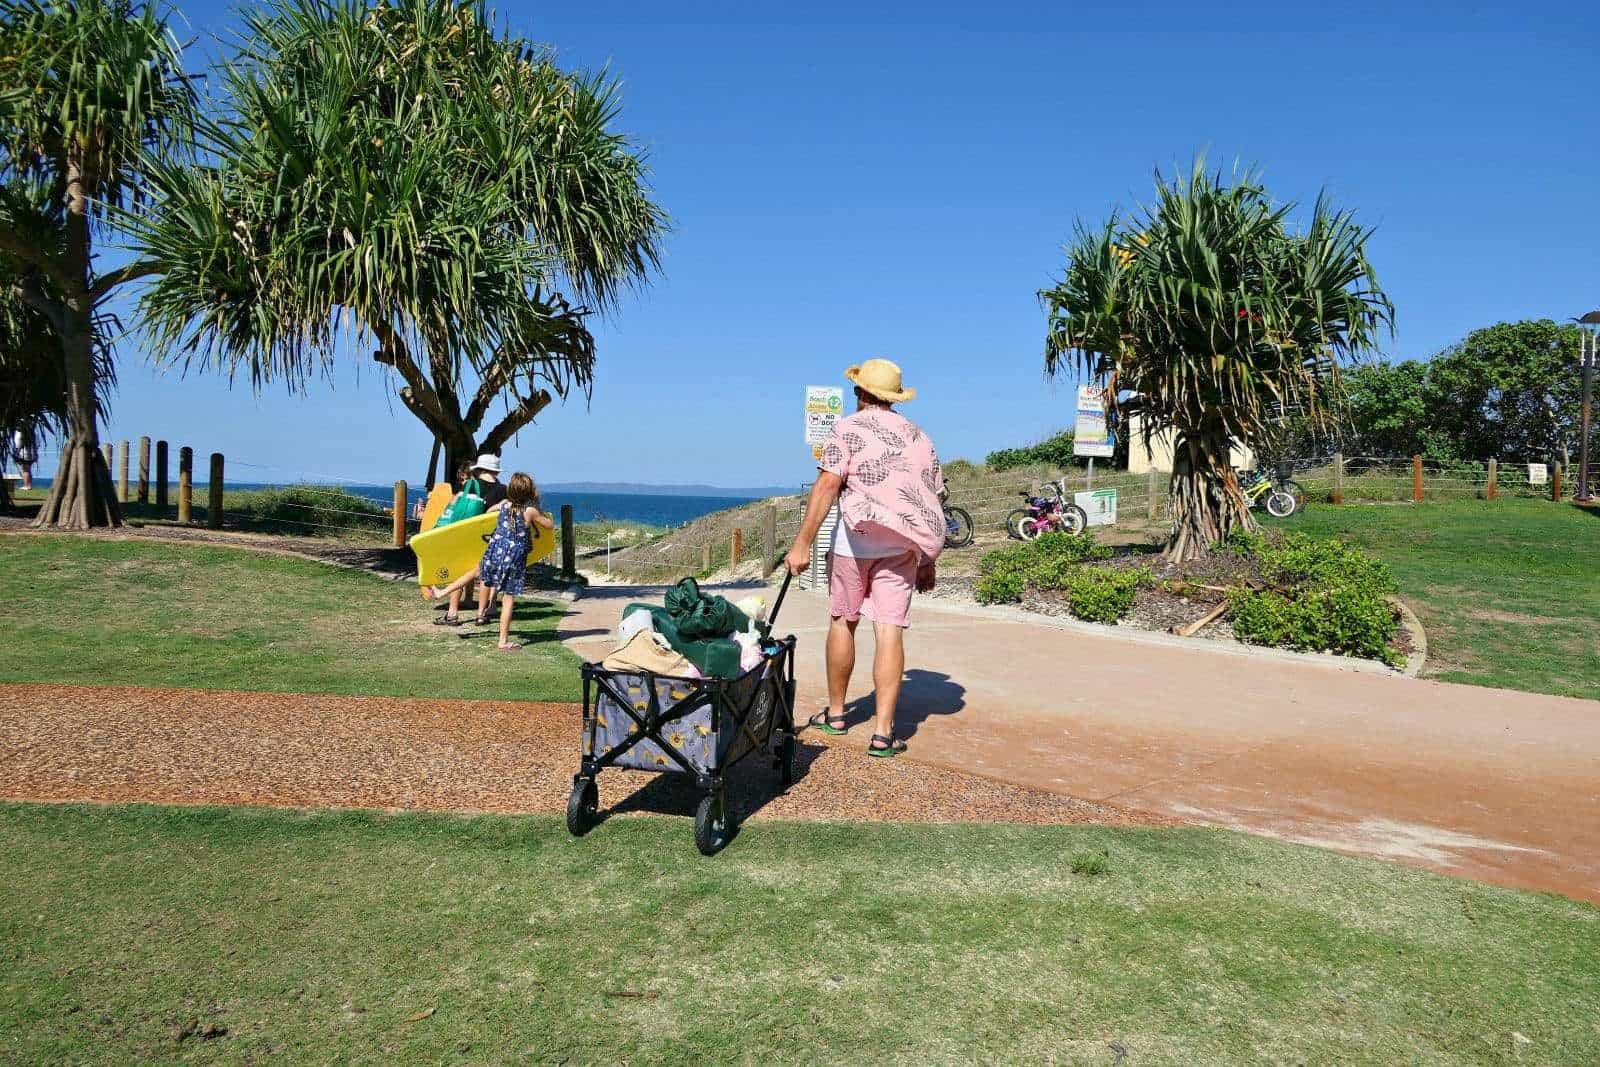 A man pulling a Buddy Wagon beach cart